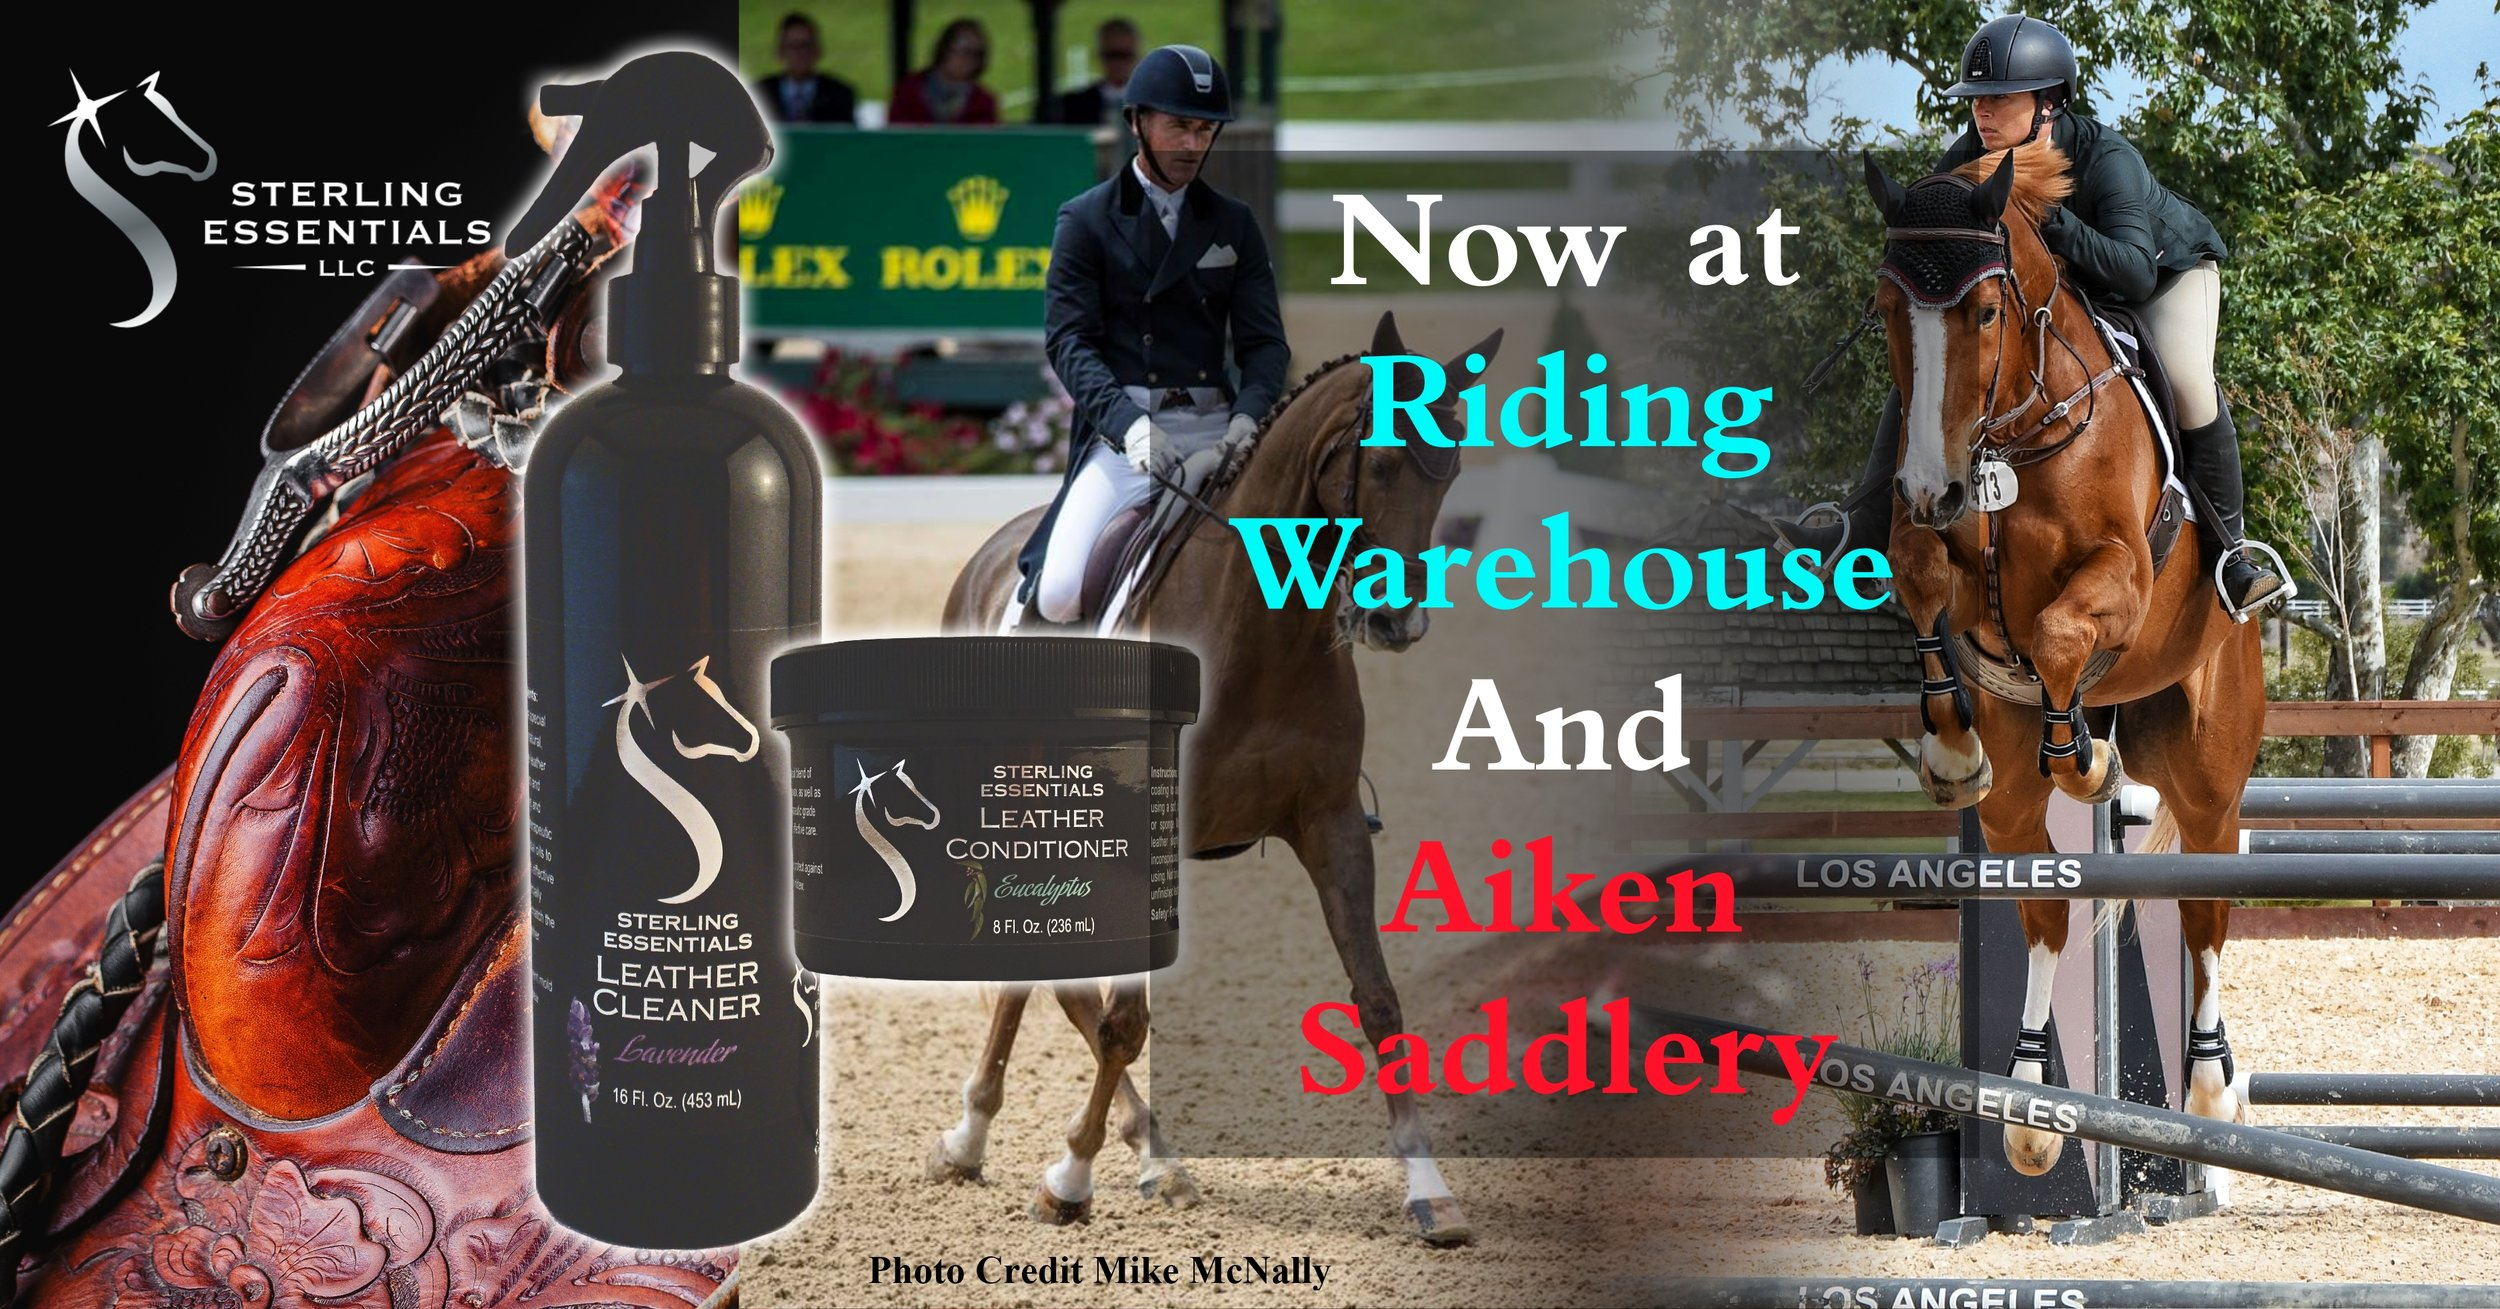 Aiken Saddlery and Riding Warehouse 6-20-2018.jpg